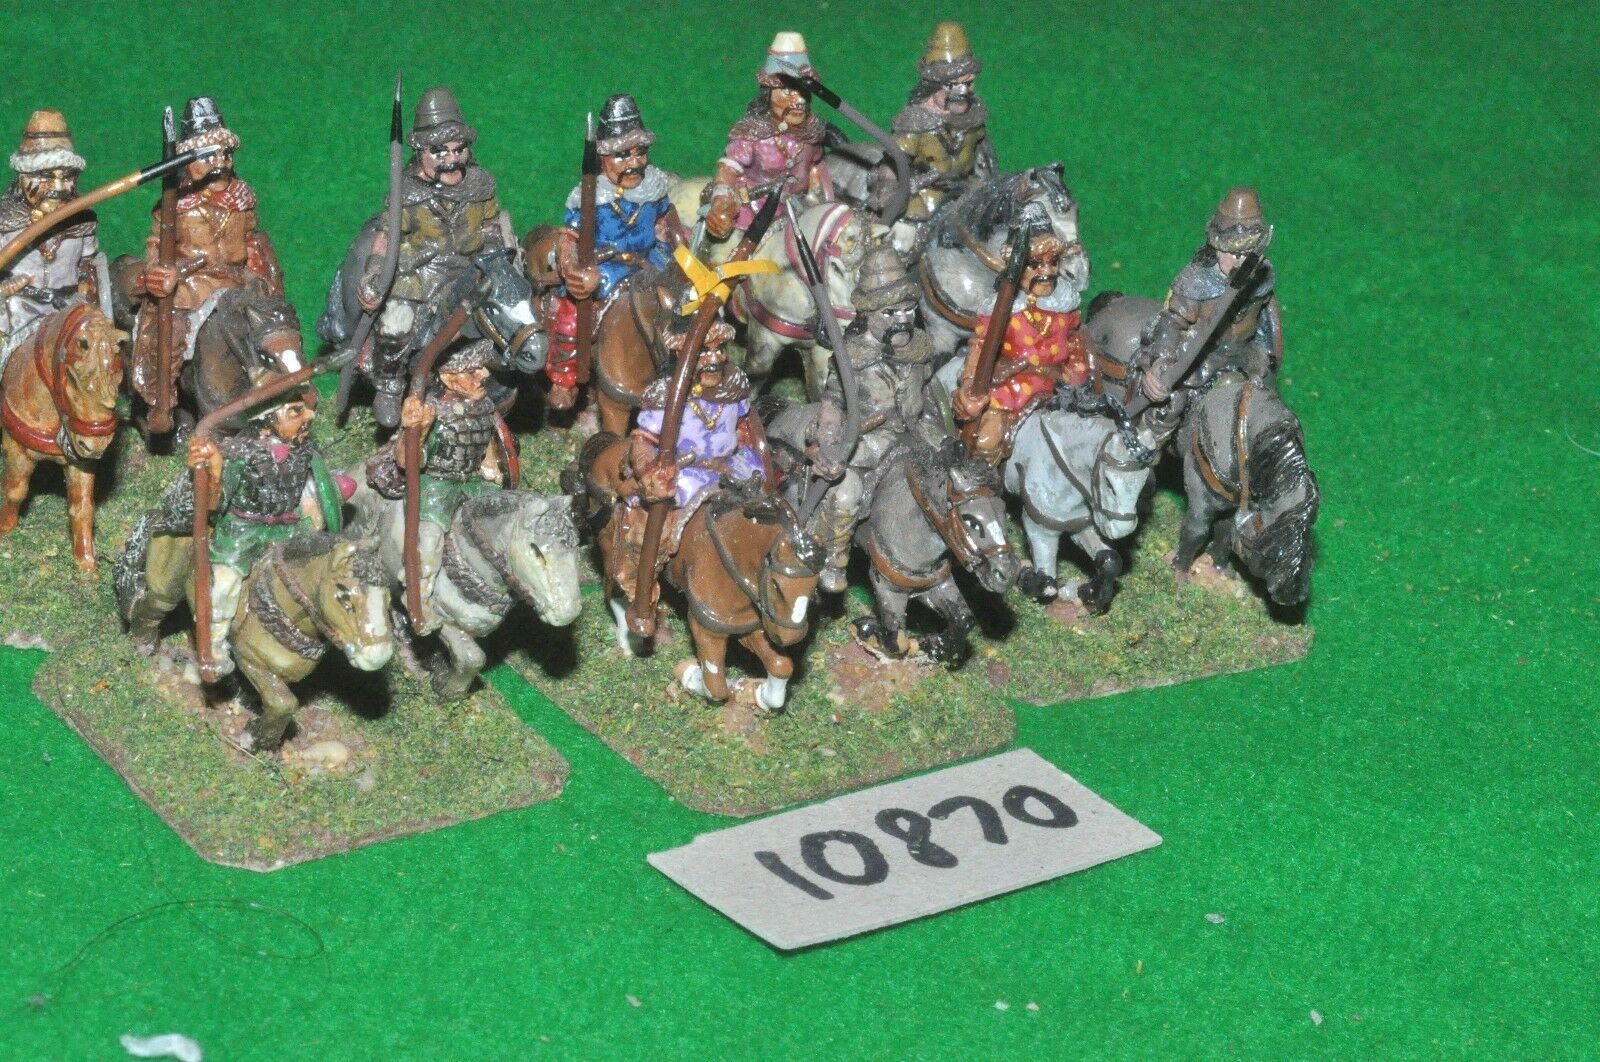 25mm hun cavalry 12 cavalry (10870)